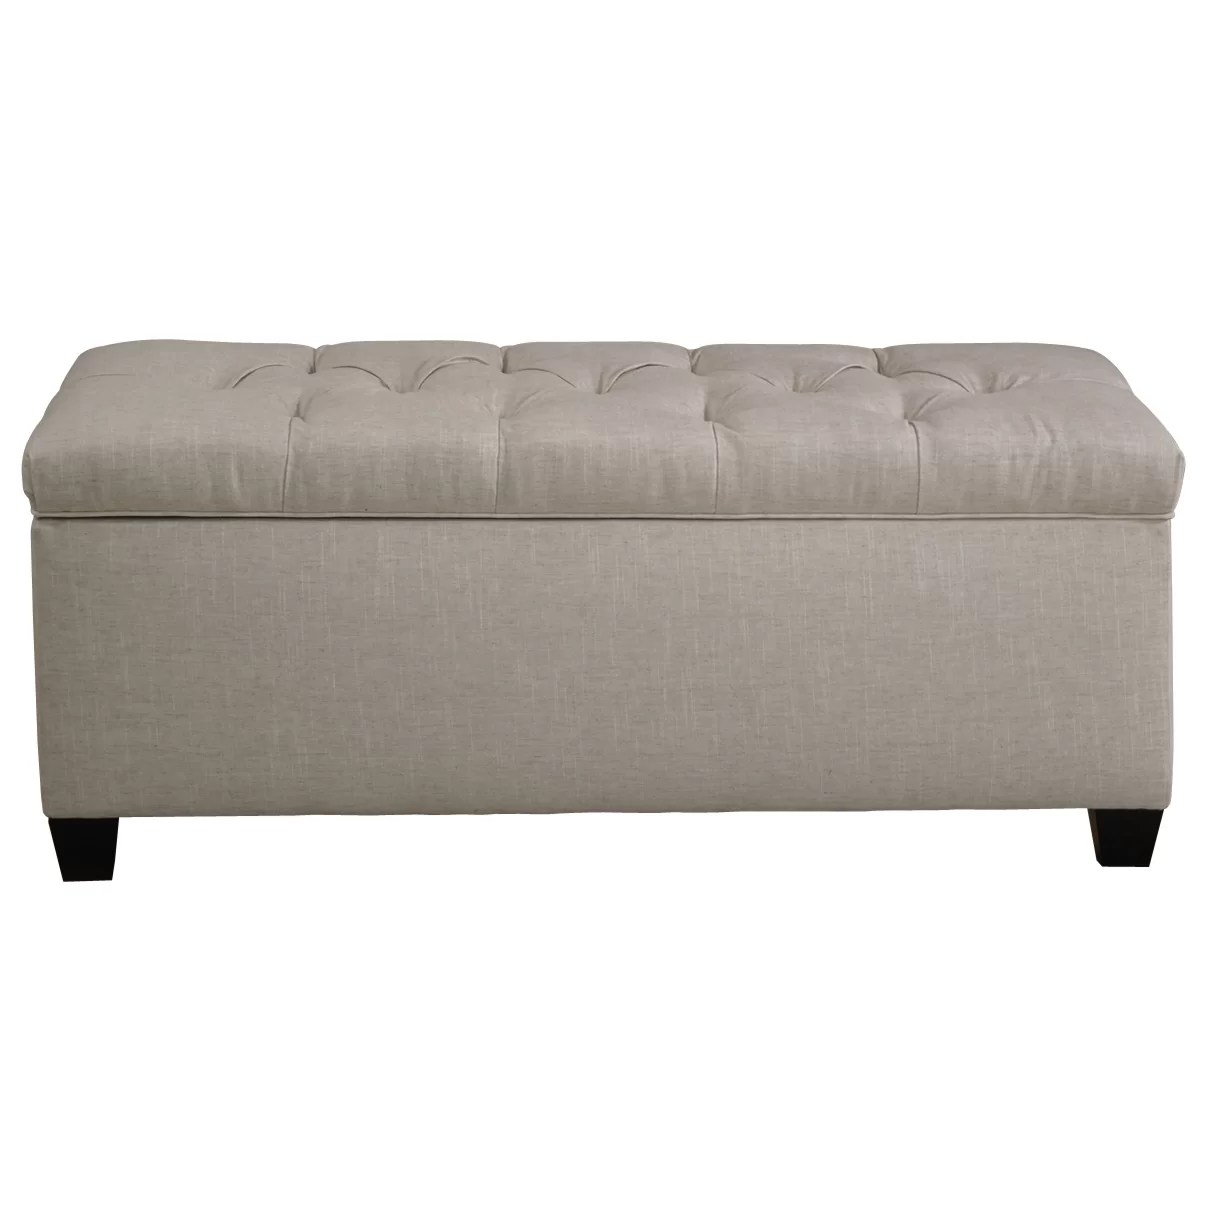 Alcott Hill Varian Upholstered Storage Bedroom Bench: Bedroom Bench With Storage